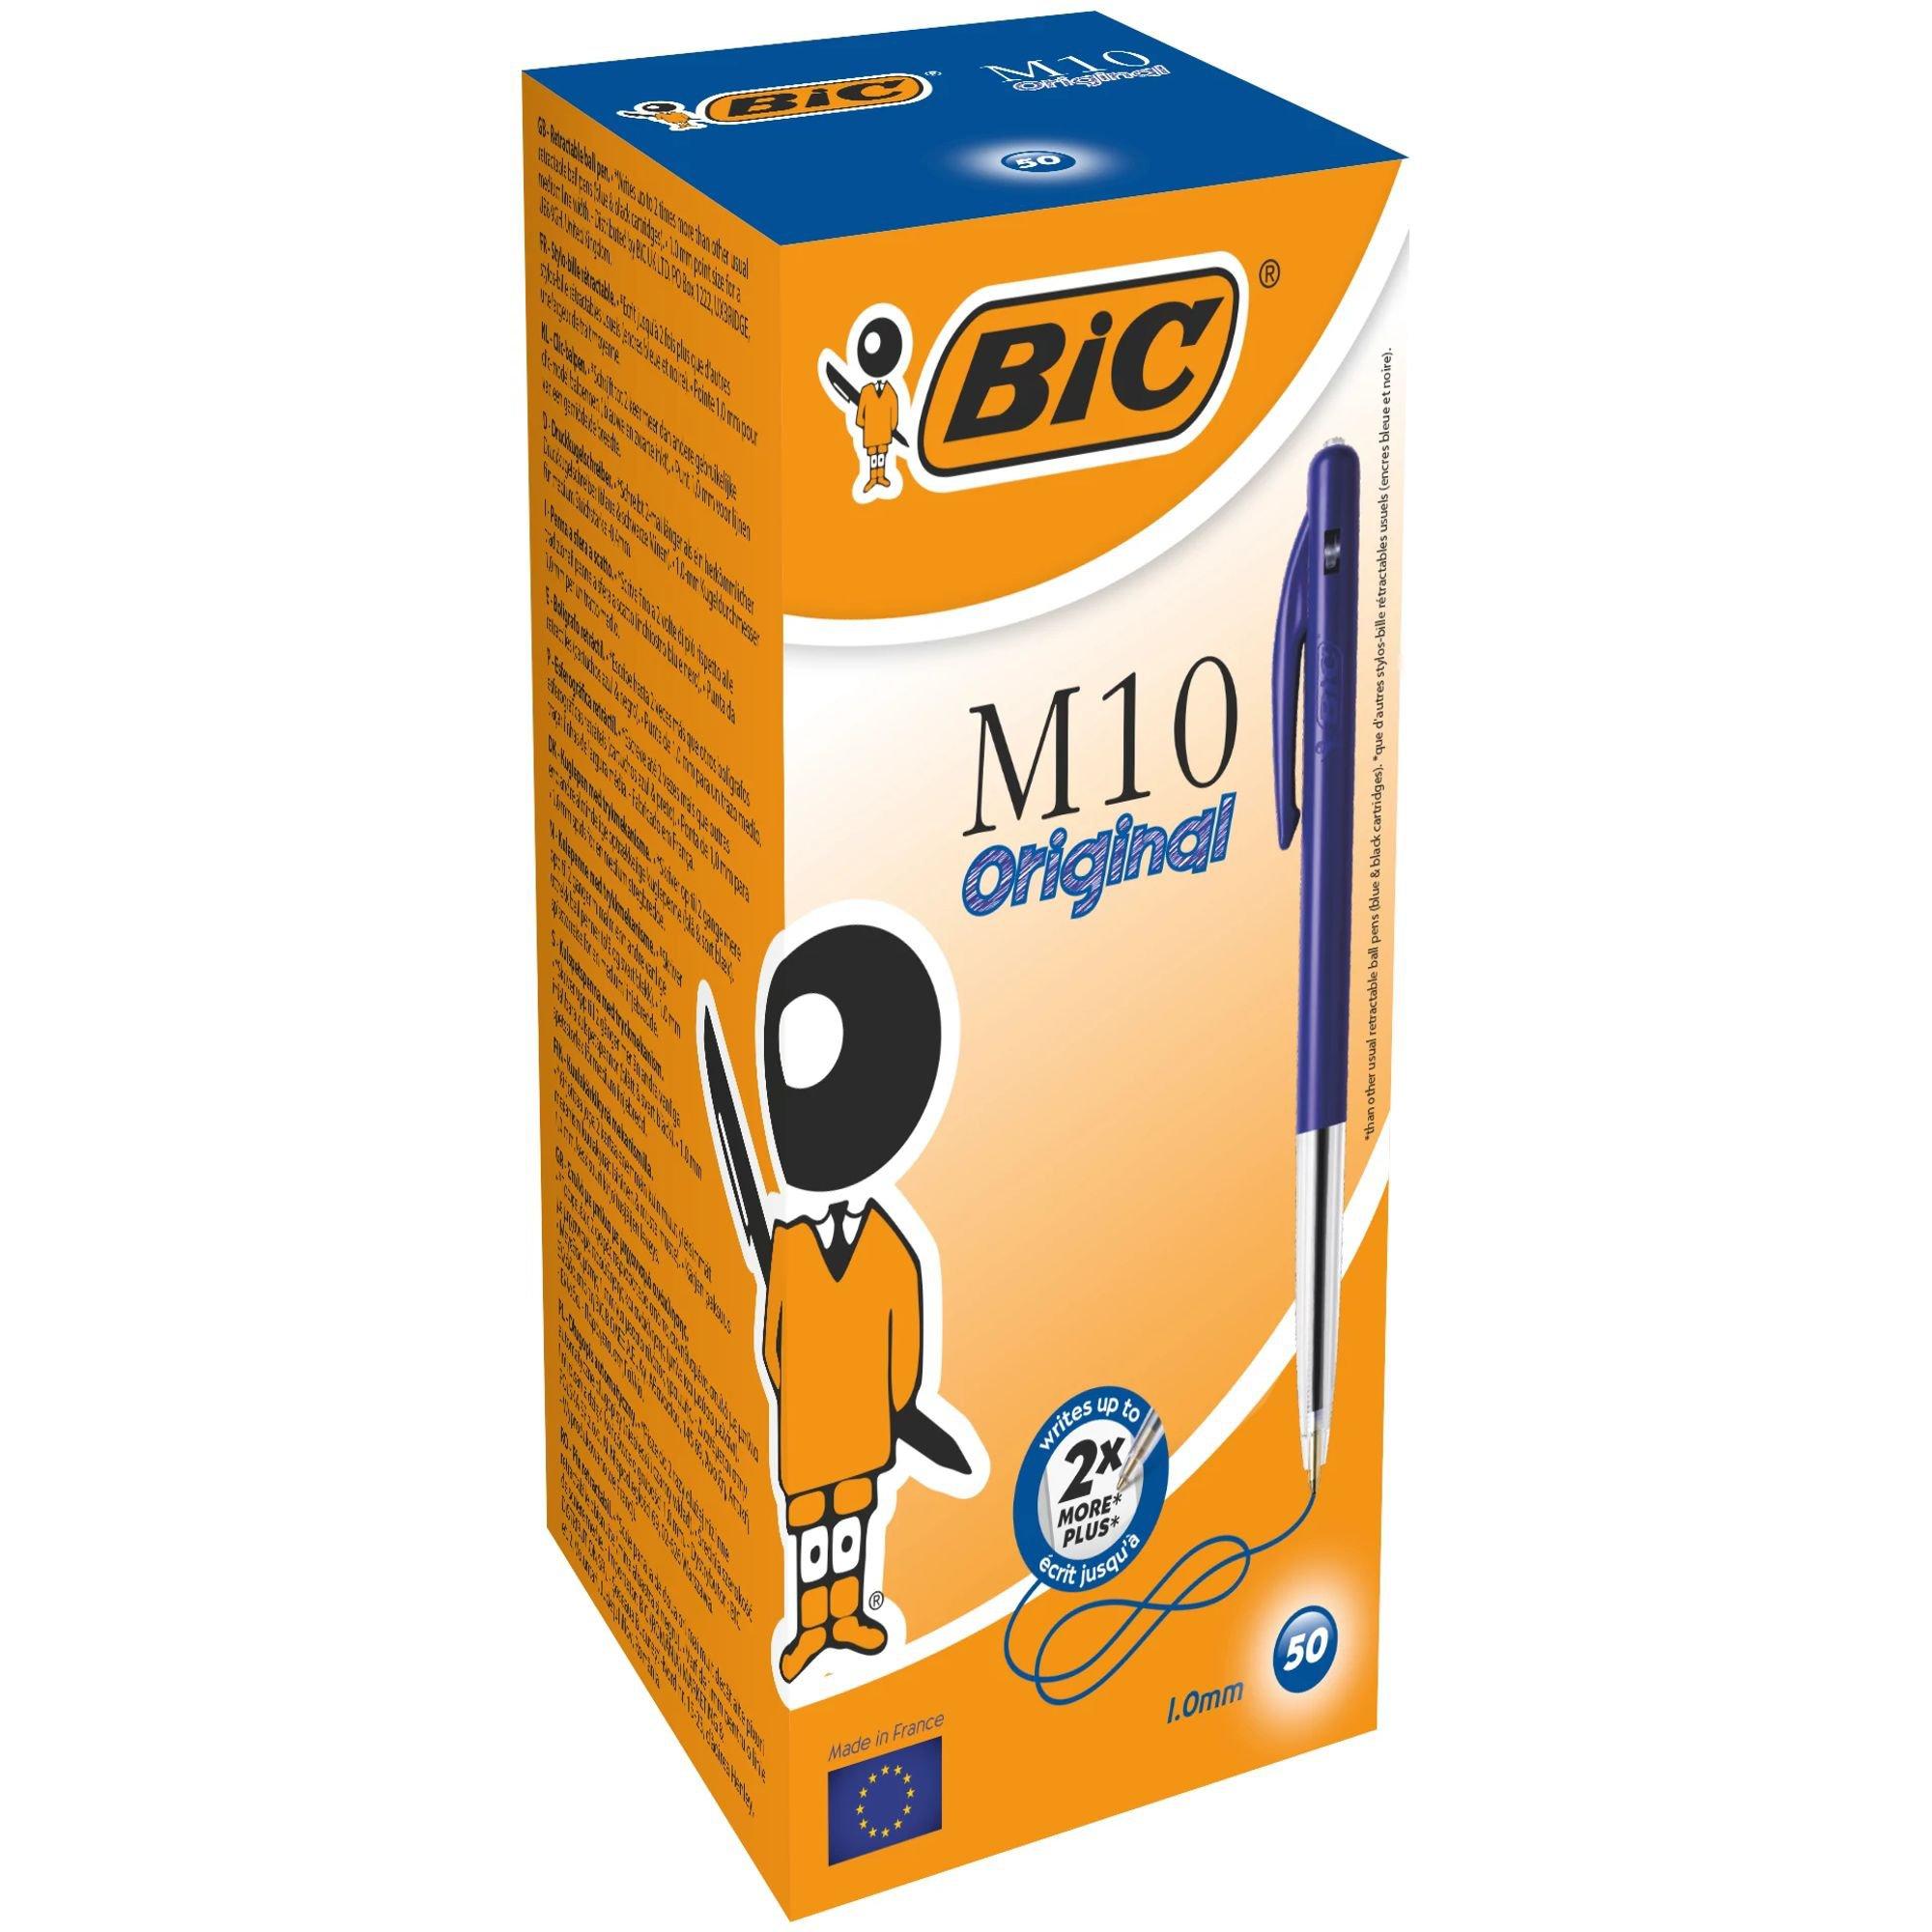 Image for BIC M10 Clic Retractable Ballpoint Pen Blue 1199190121